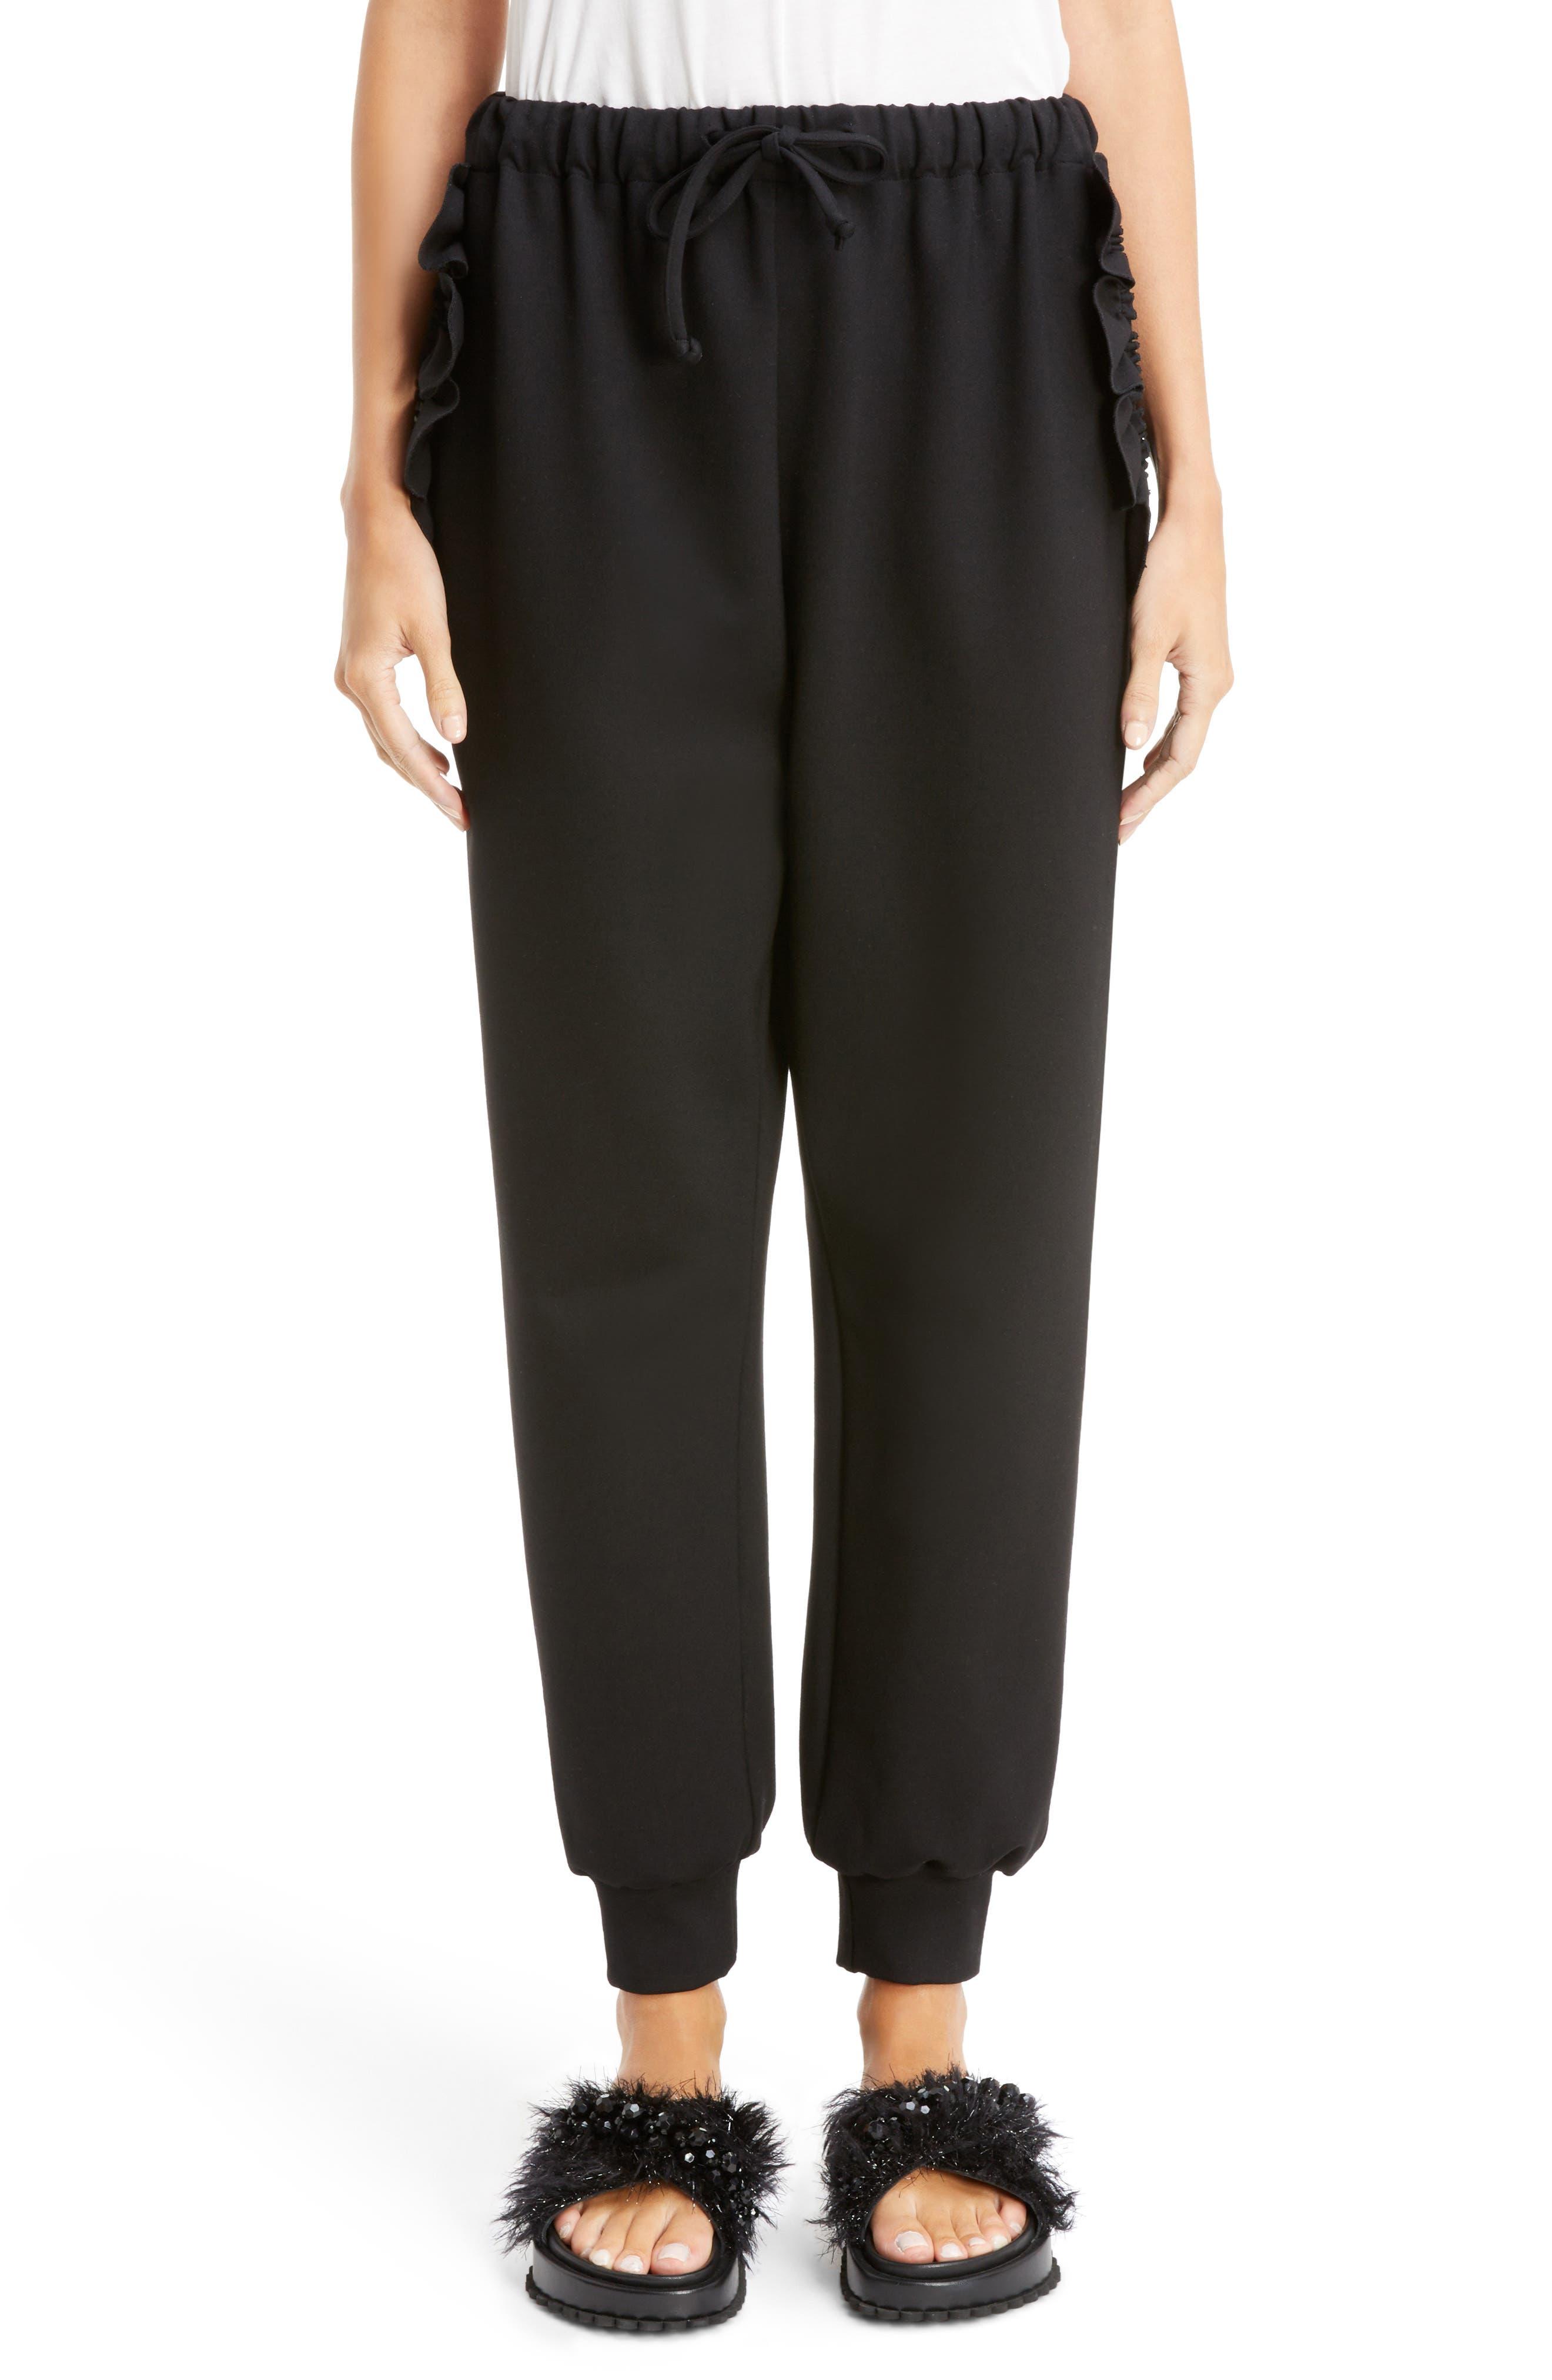 Ruffle Embellished Jogging Pants,                             Main thumbnail 1, color,                             BLACK